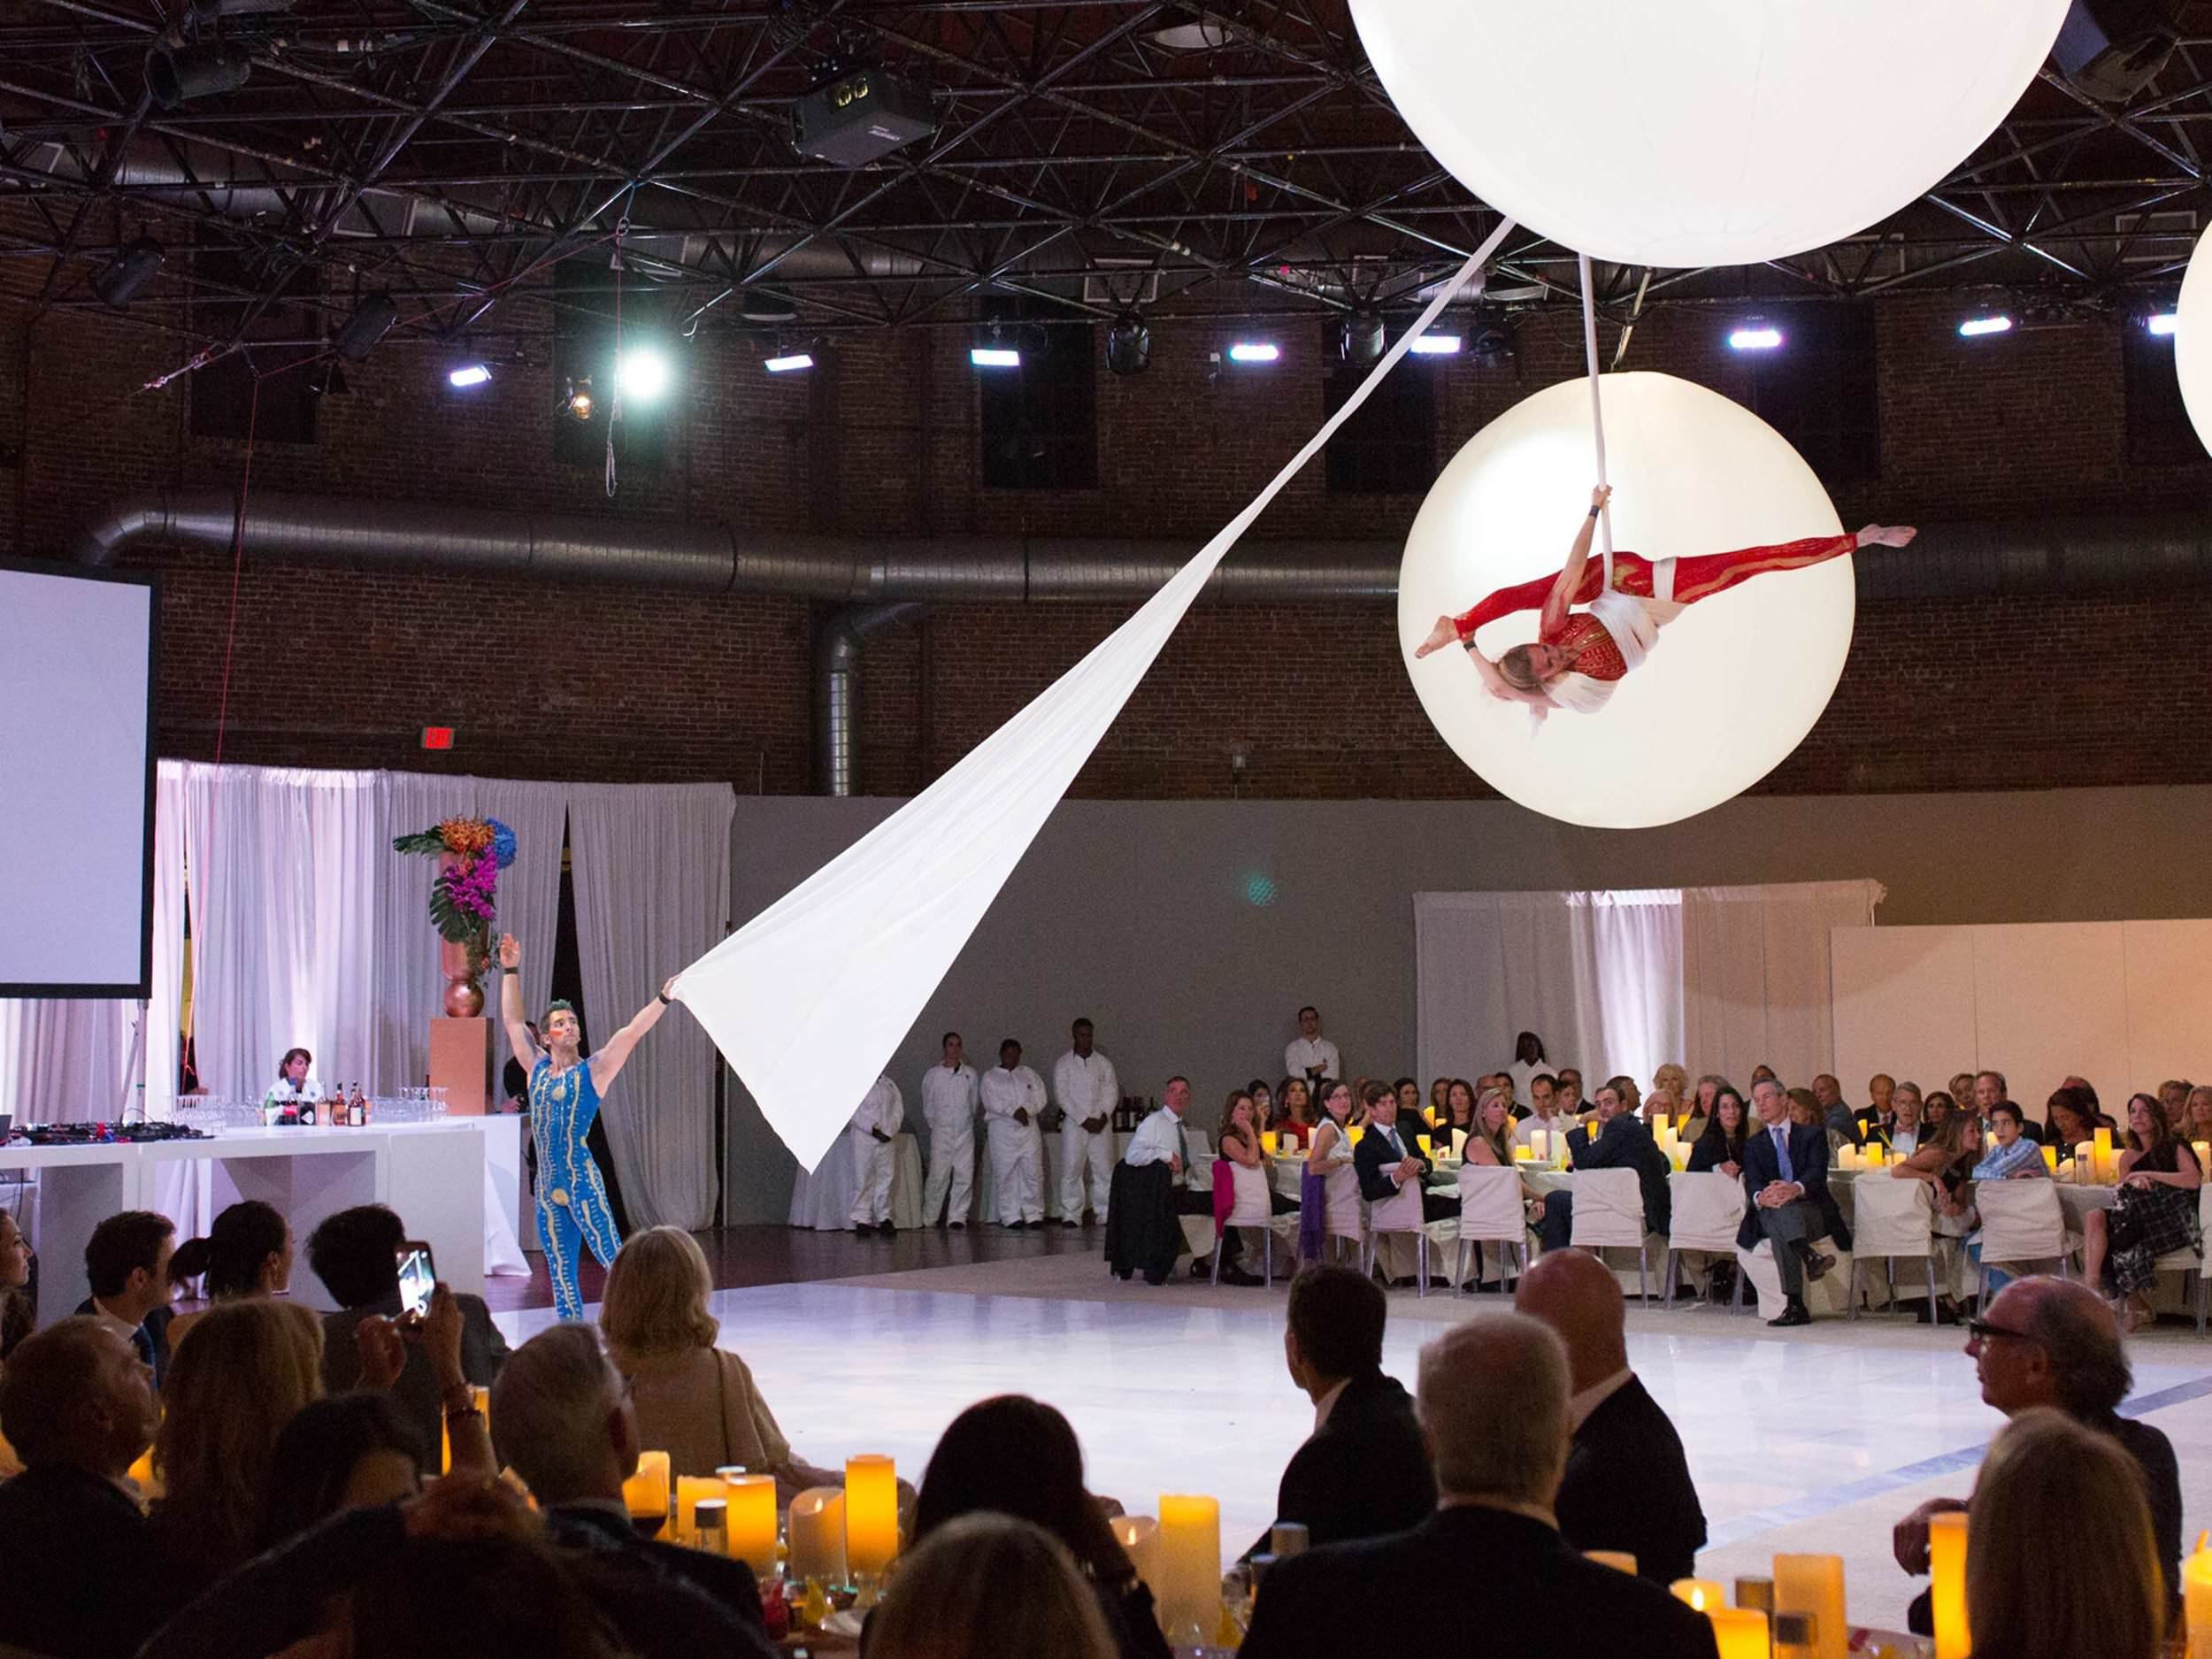 aerialist-art-theme-bar-mitzvah-at-cyclorama-in-boston-ma-harrington-events.jpg